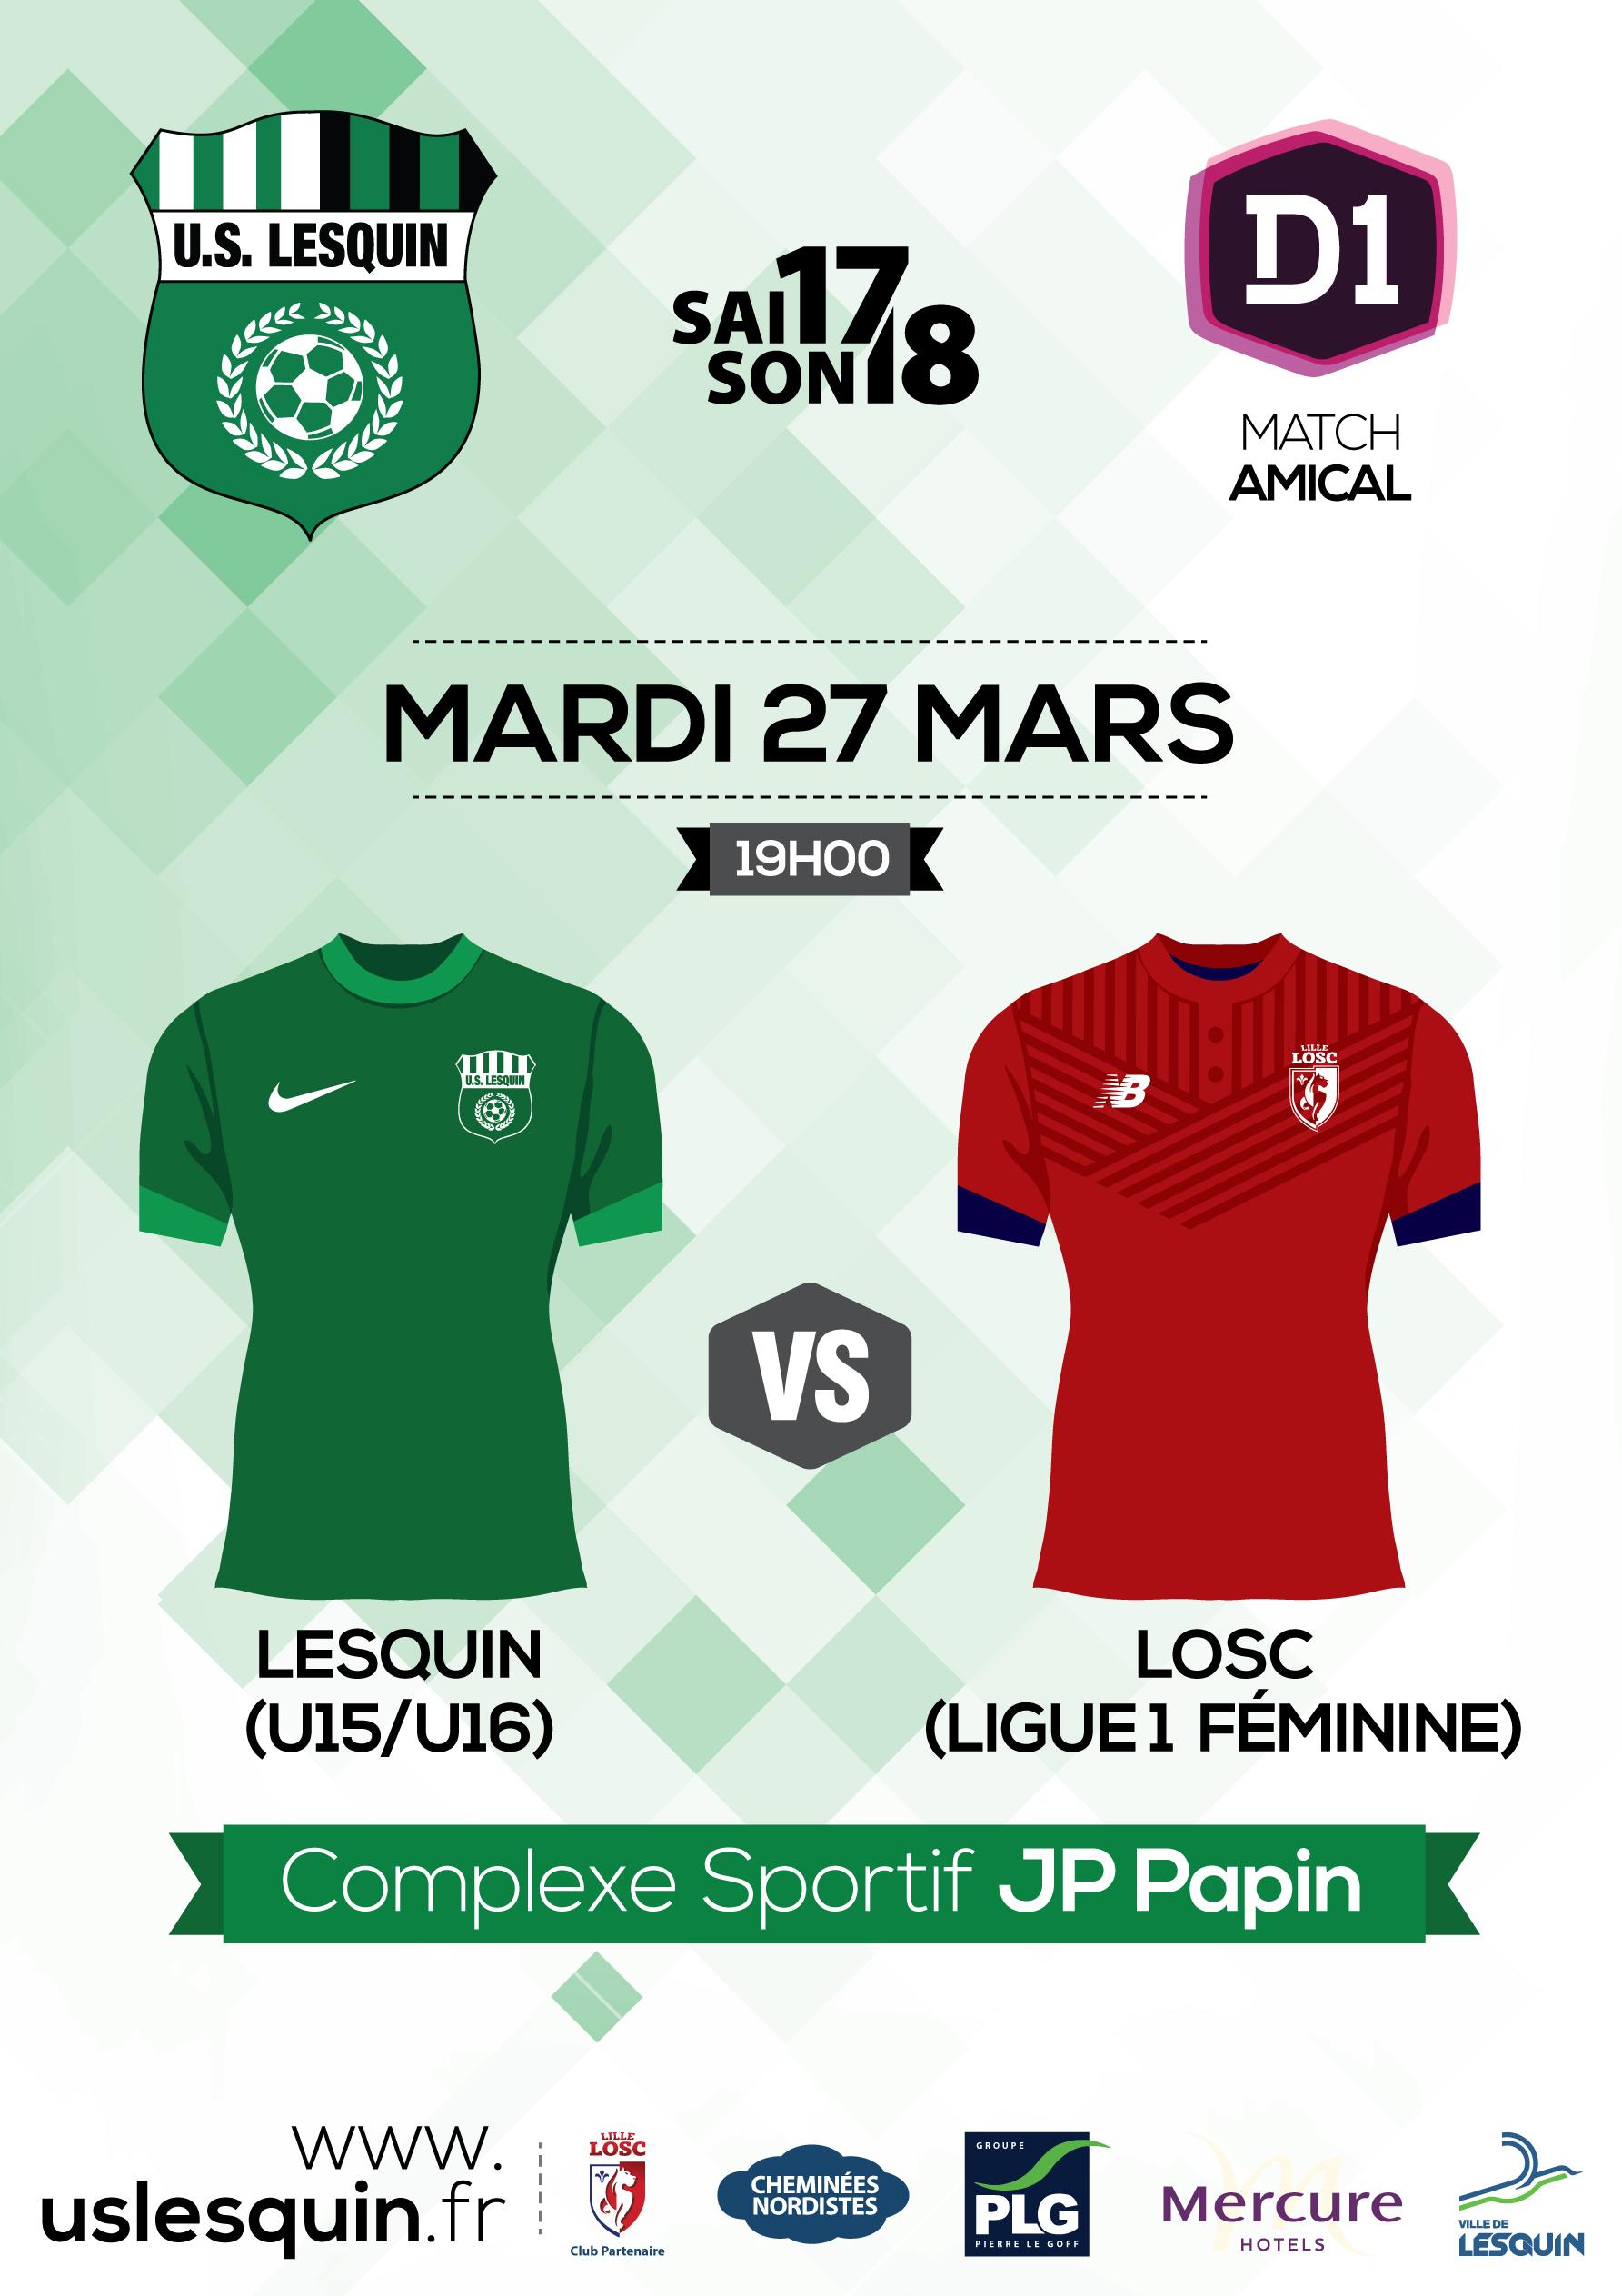 Lesquin vs Losc Ligue 1 Féminine